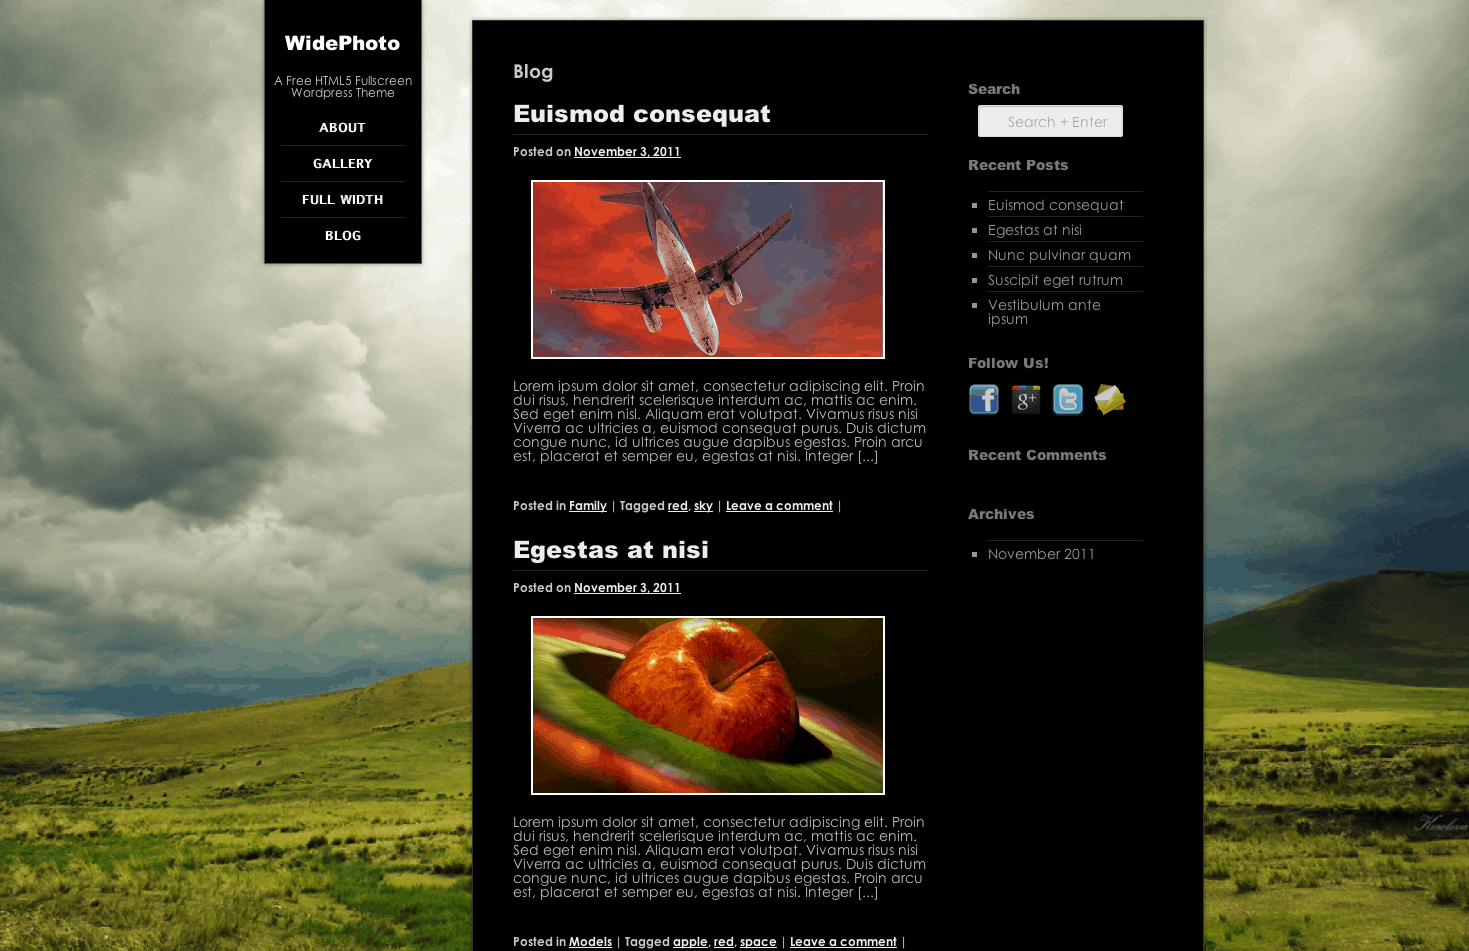 widephoto blog